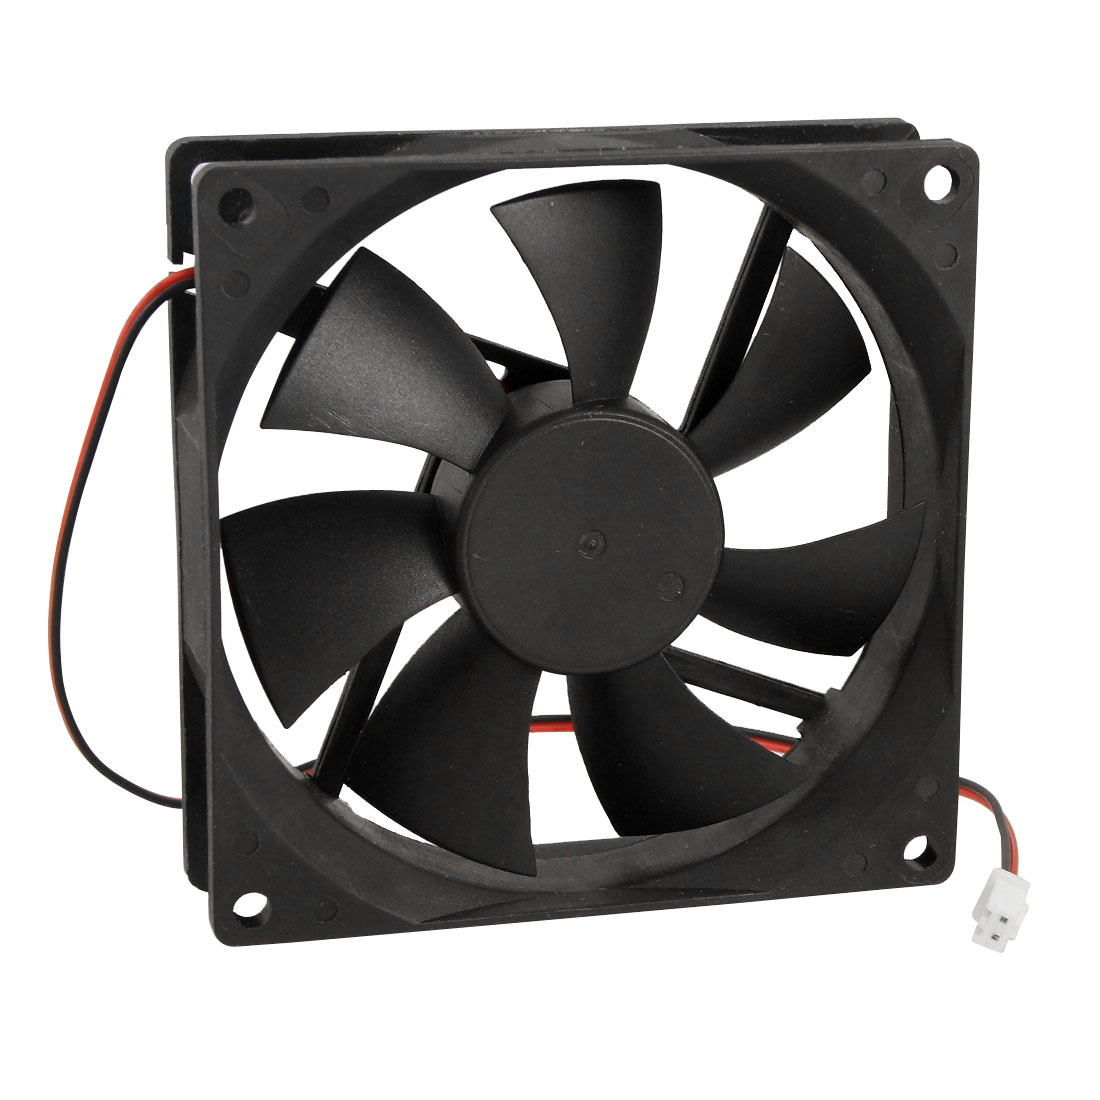 90mm x 25mm DC 12V 2 Terminals Cooling Fan for Computer Case CPU Cooler